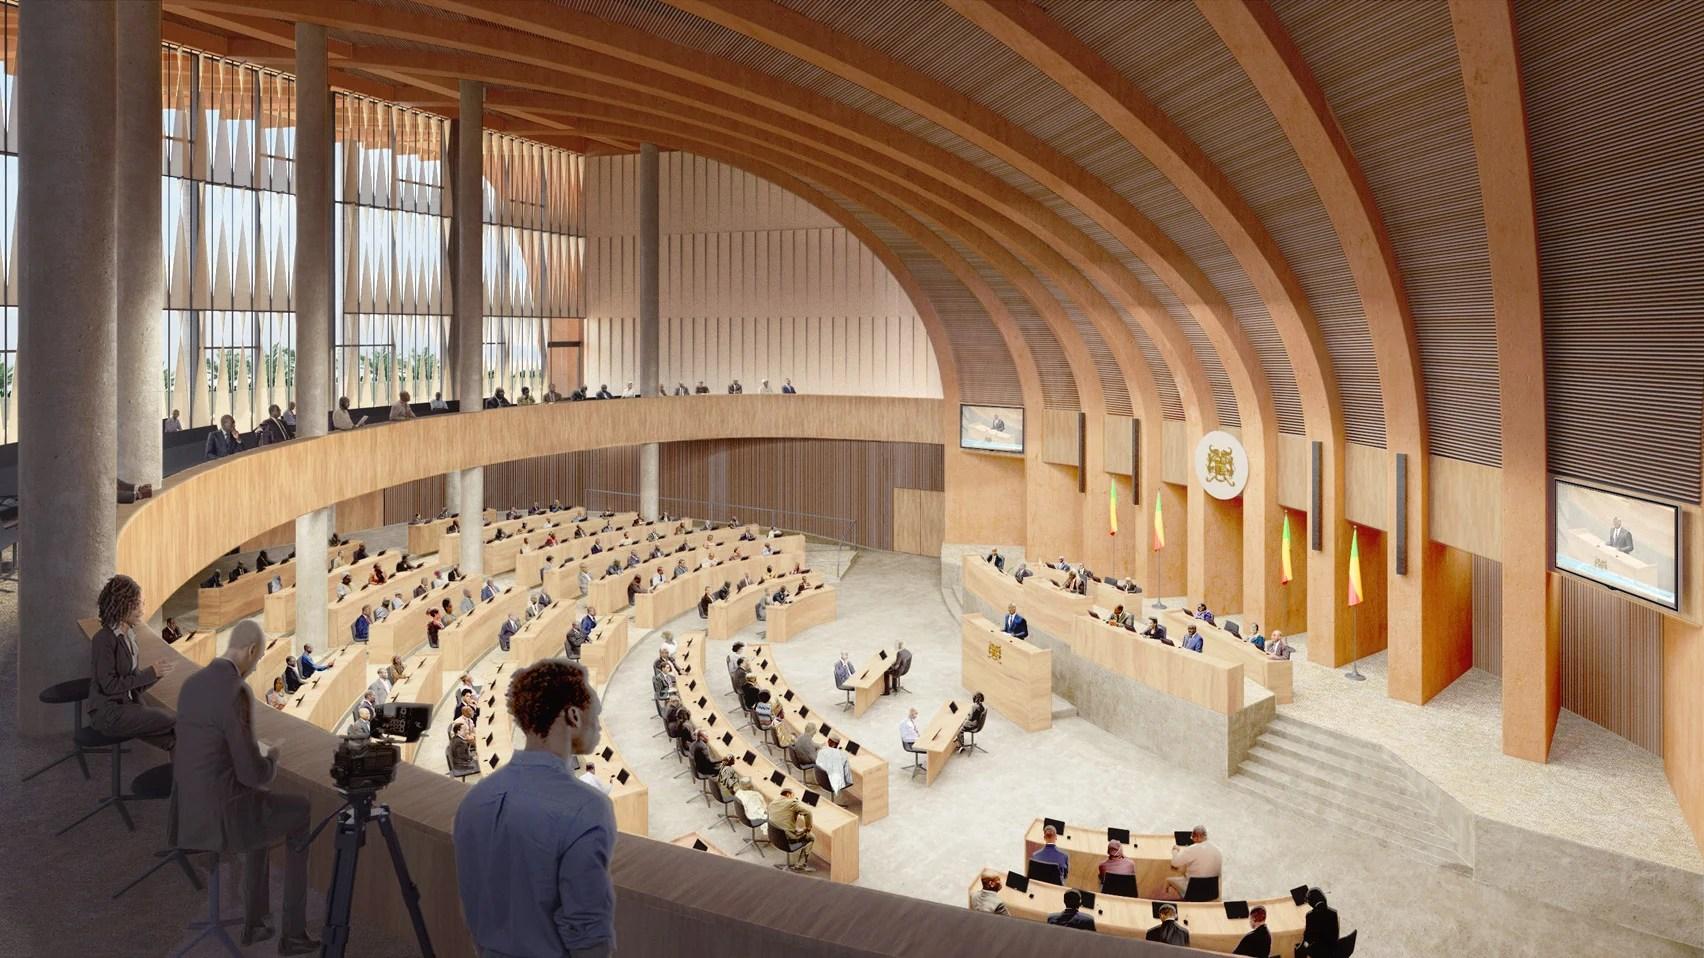 Benin parliament main assembly hall